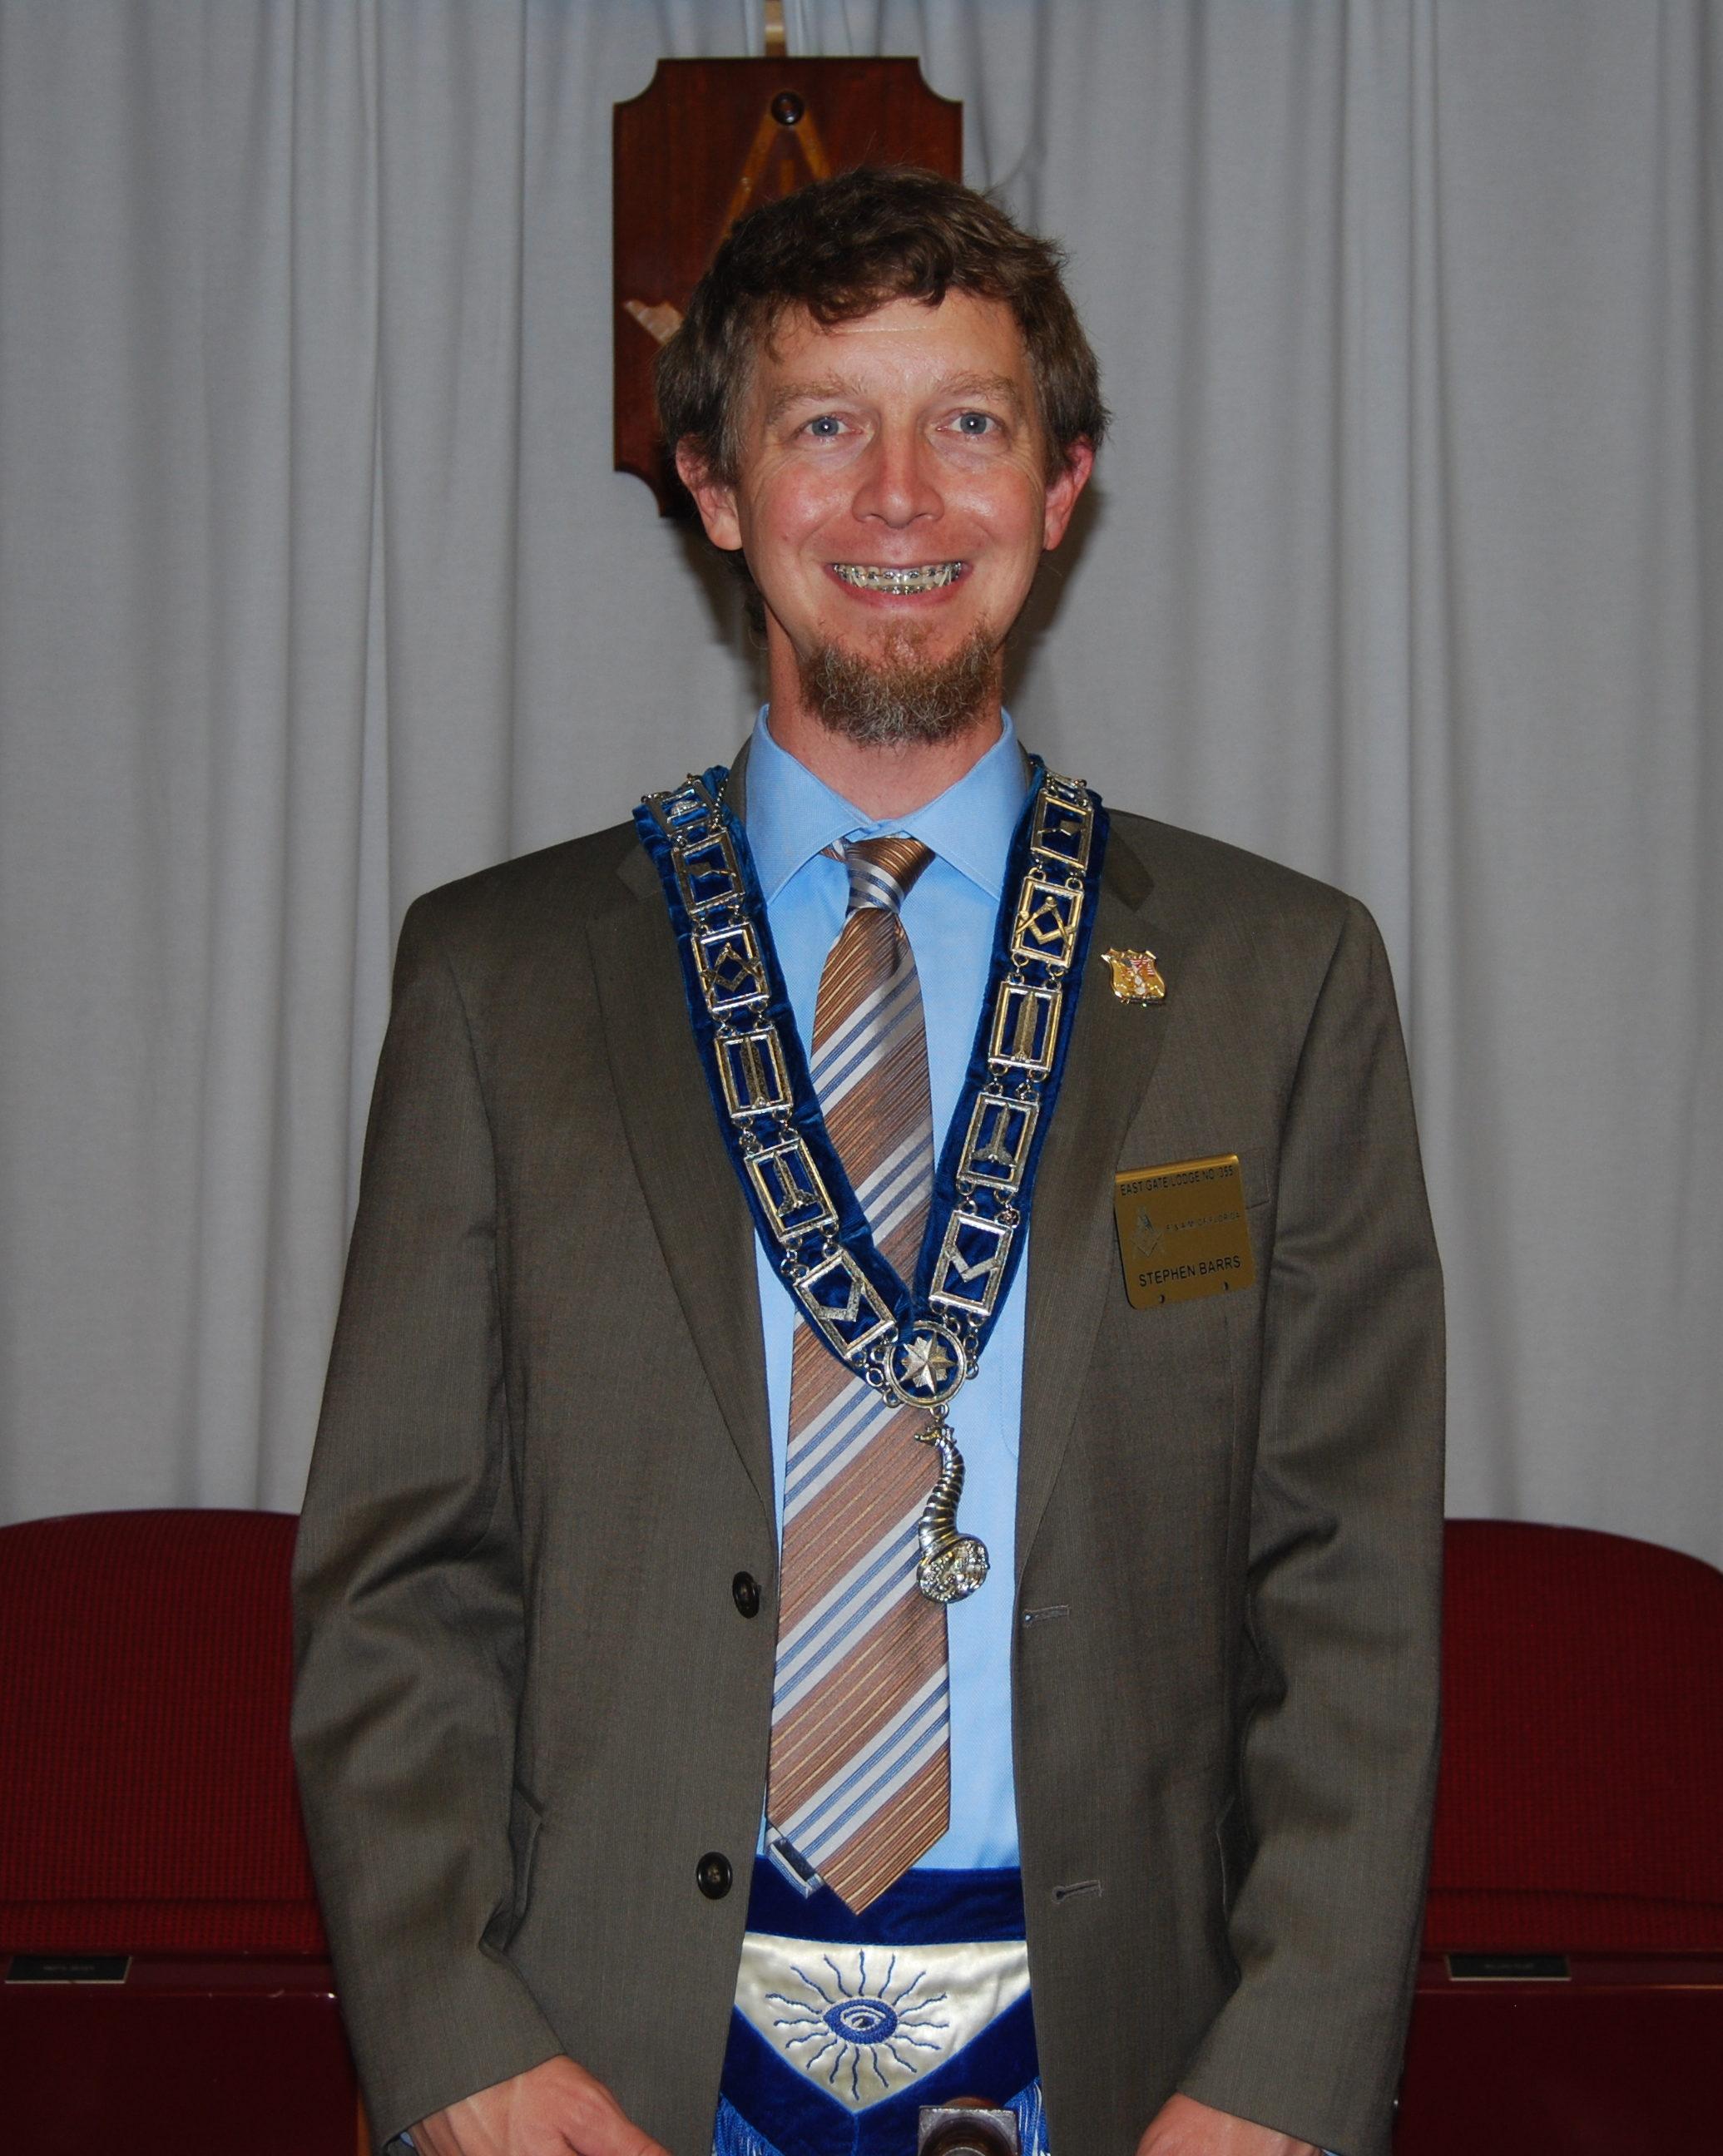 Stephen G. Barrs